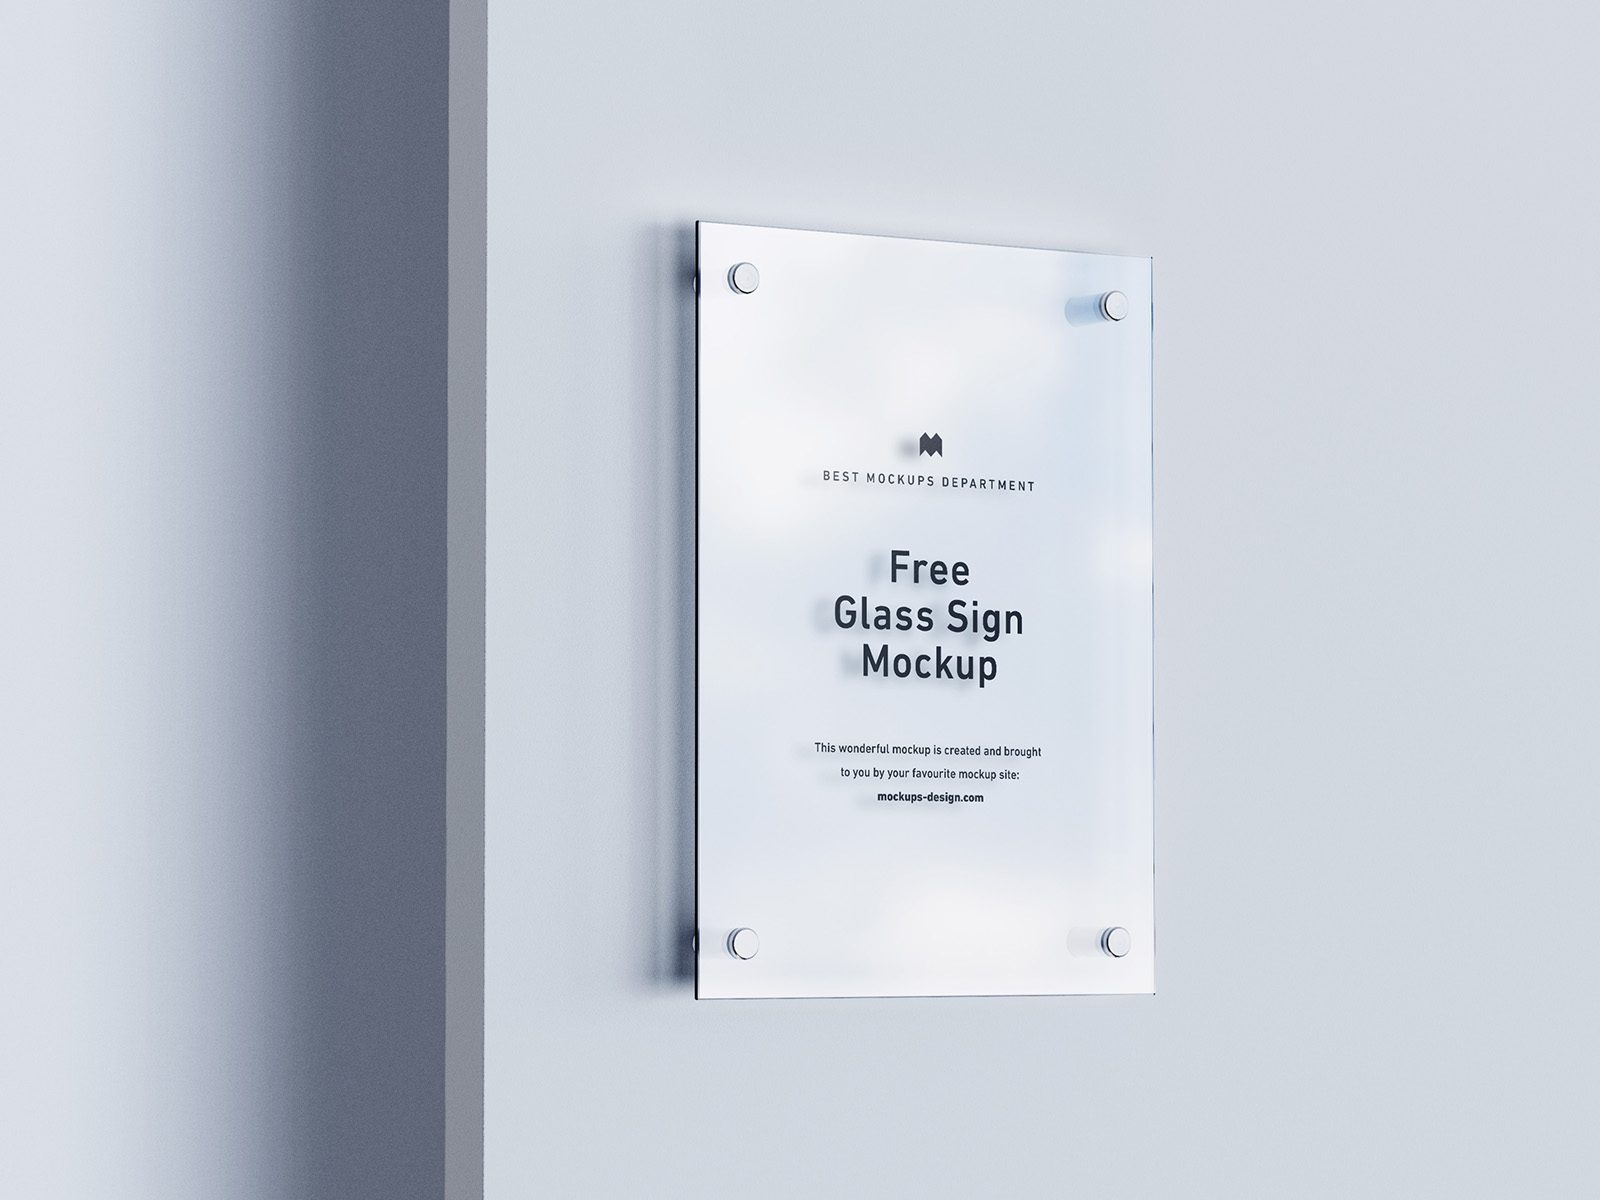 Free glass sign mockup